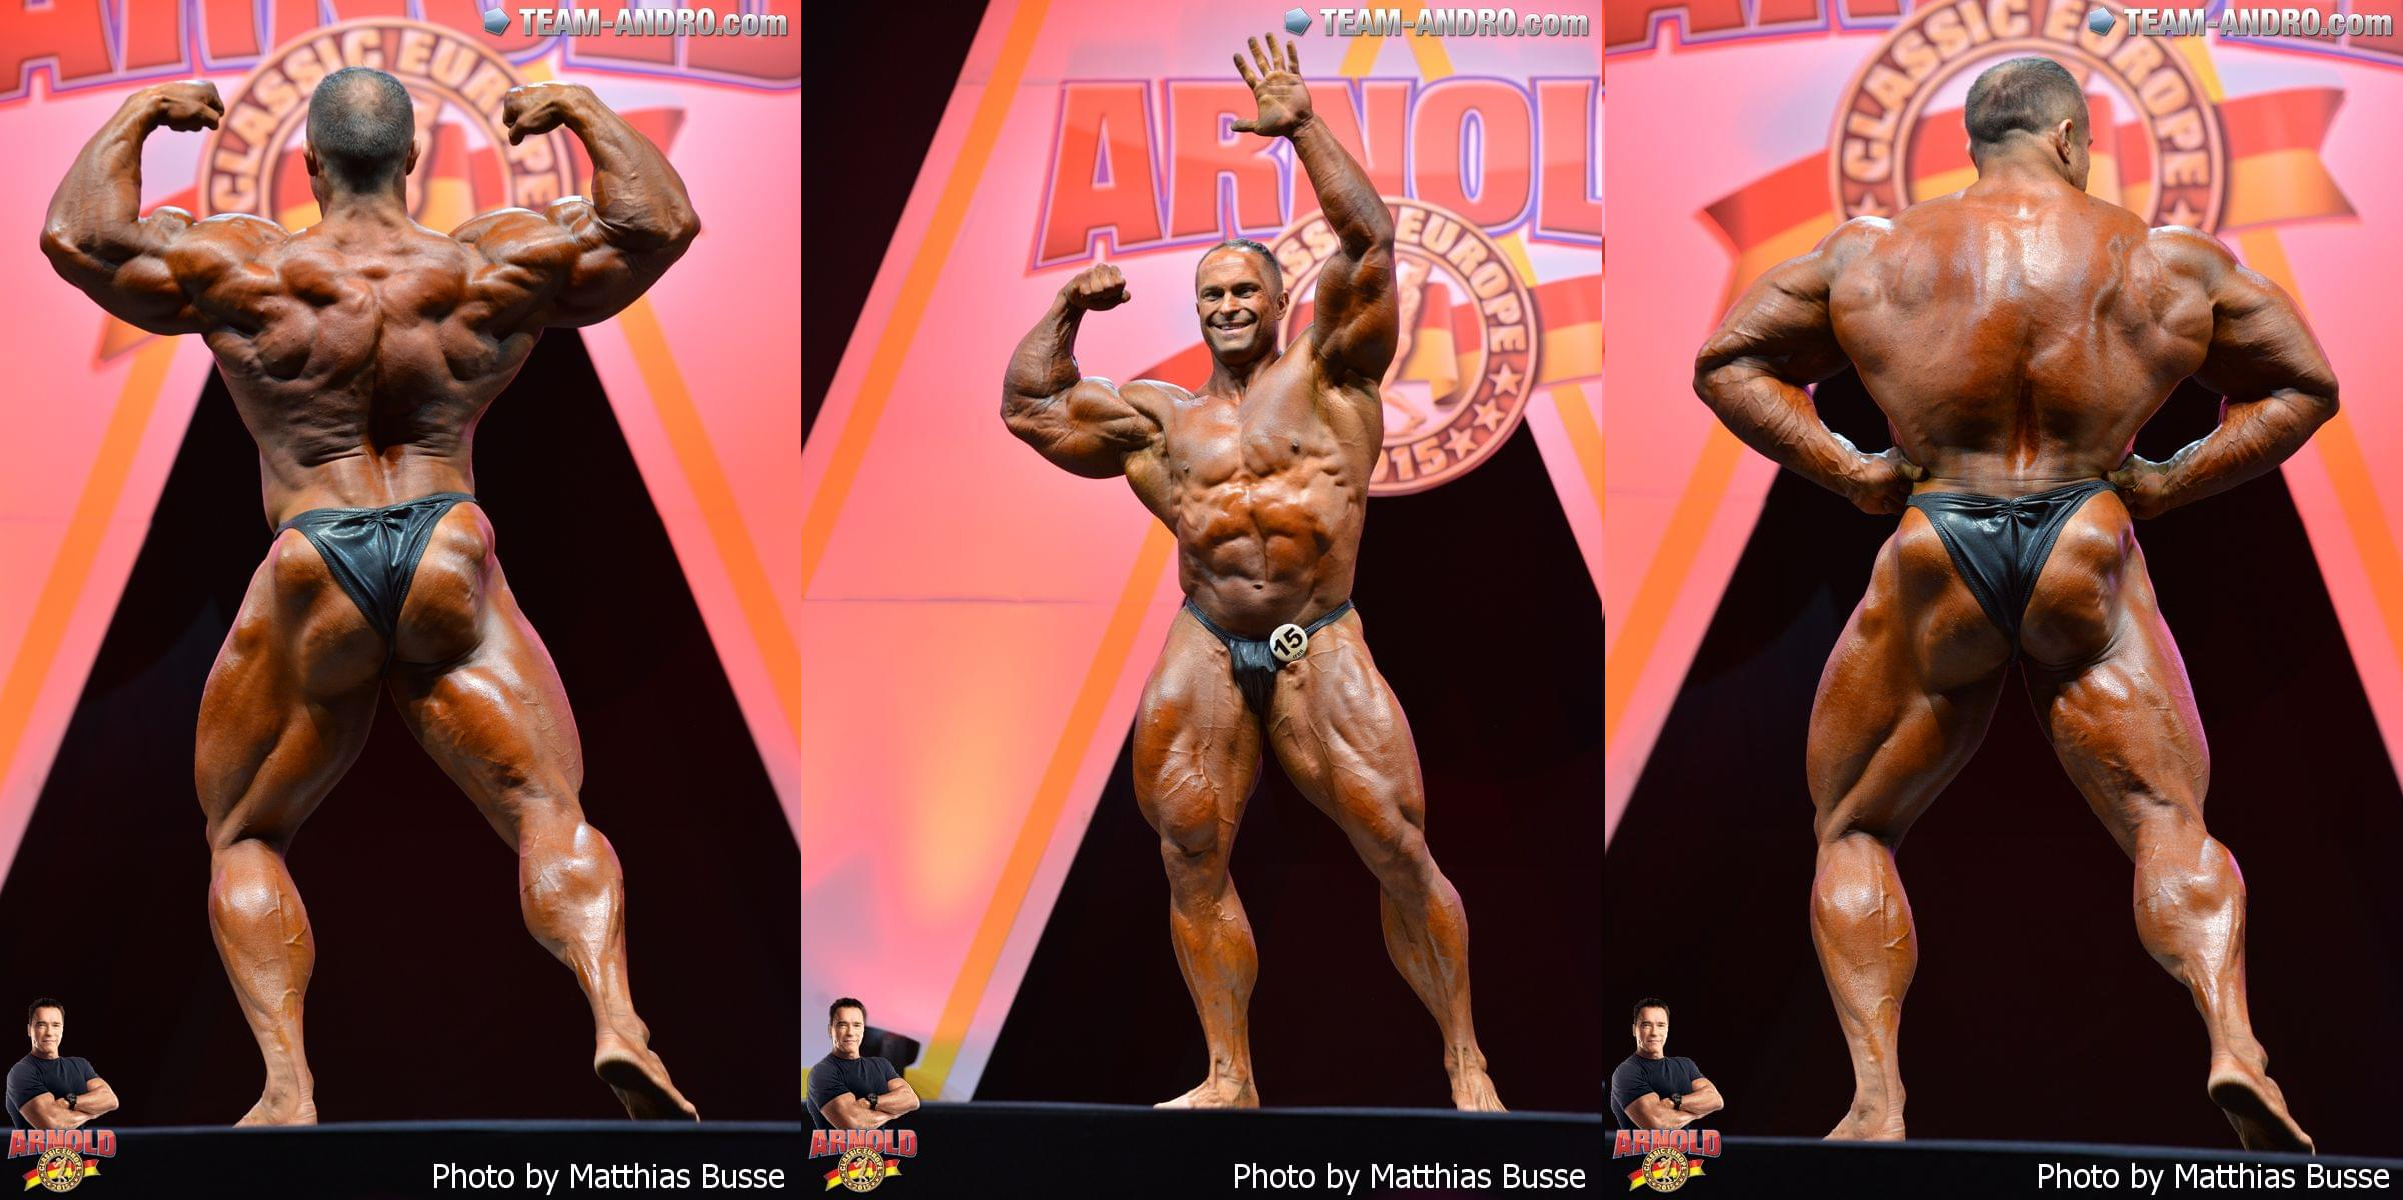 Alex Fedorov (Russia) - 12 место